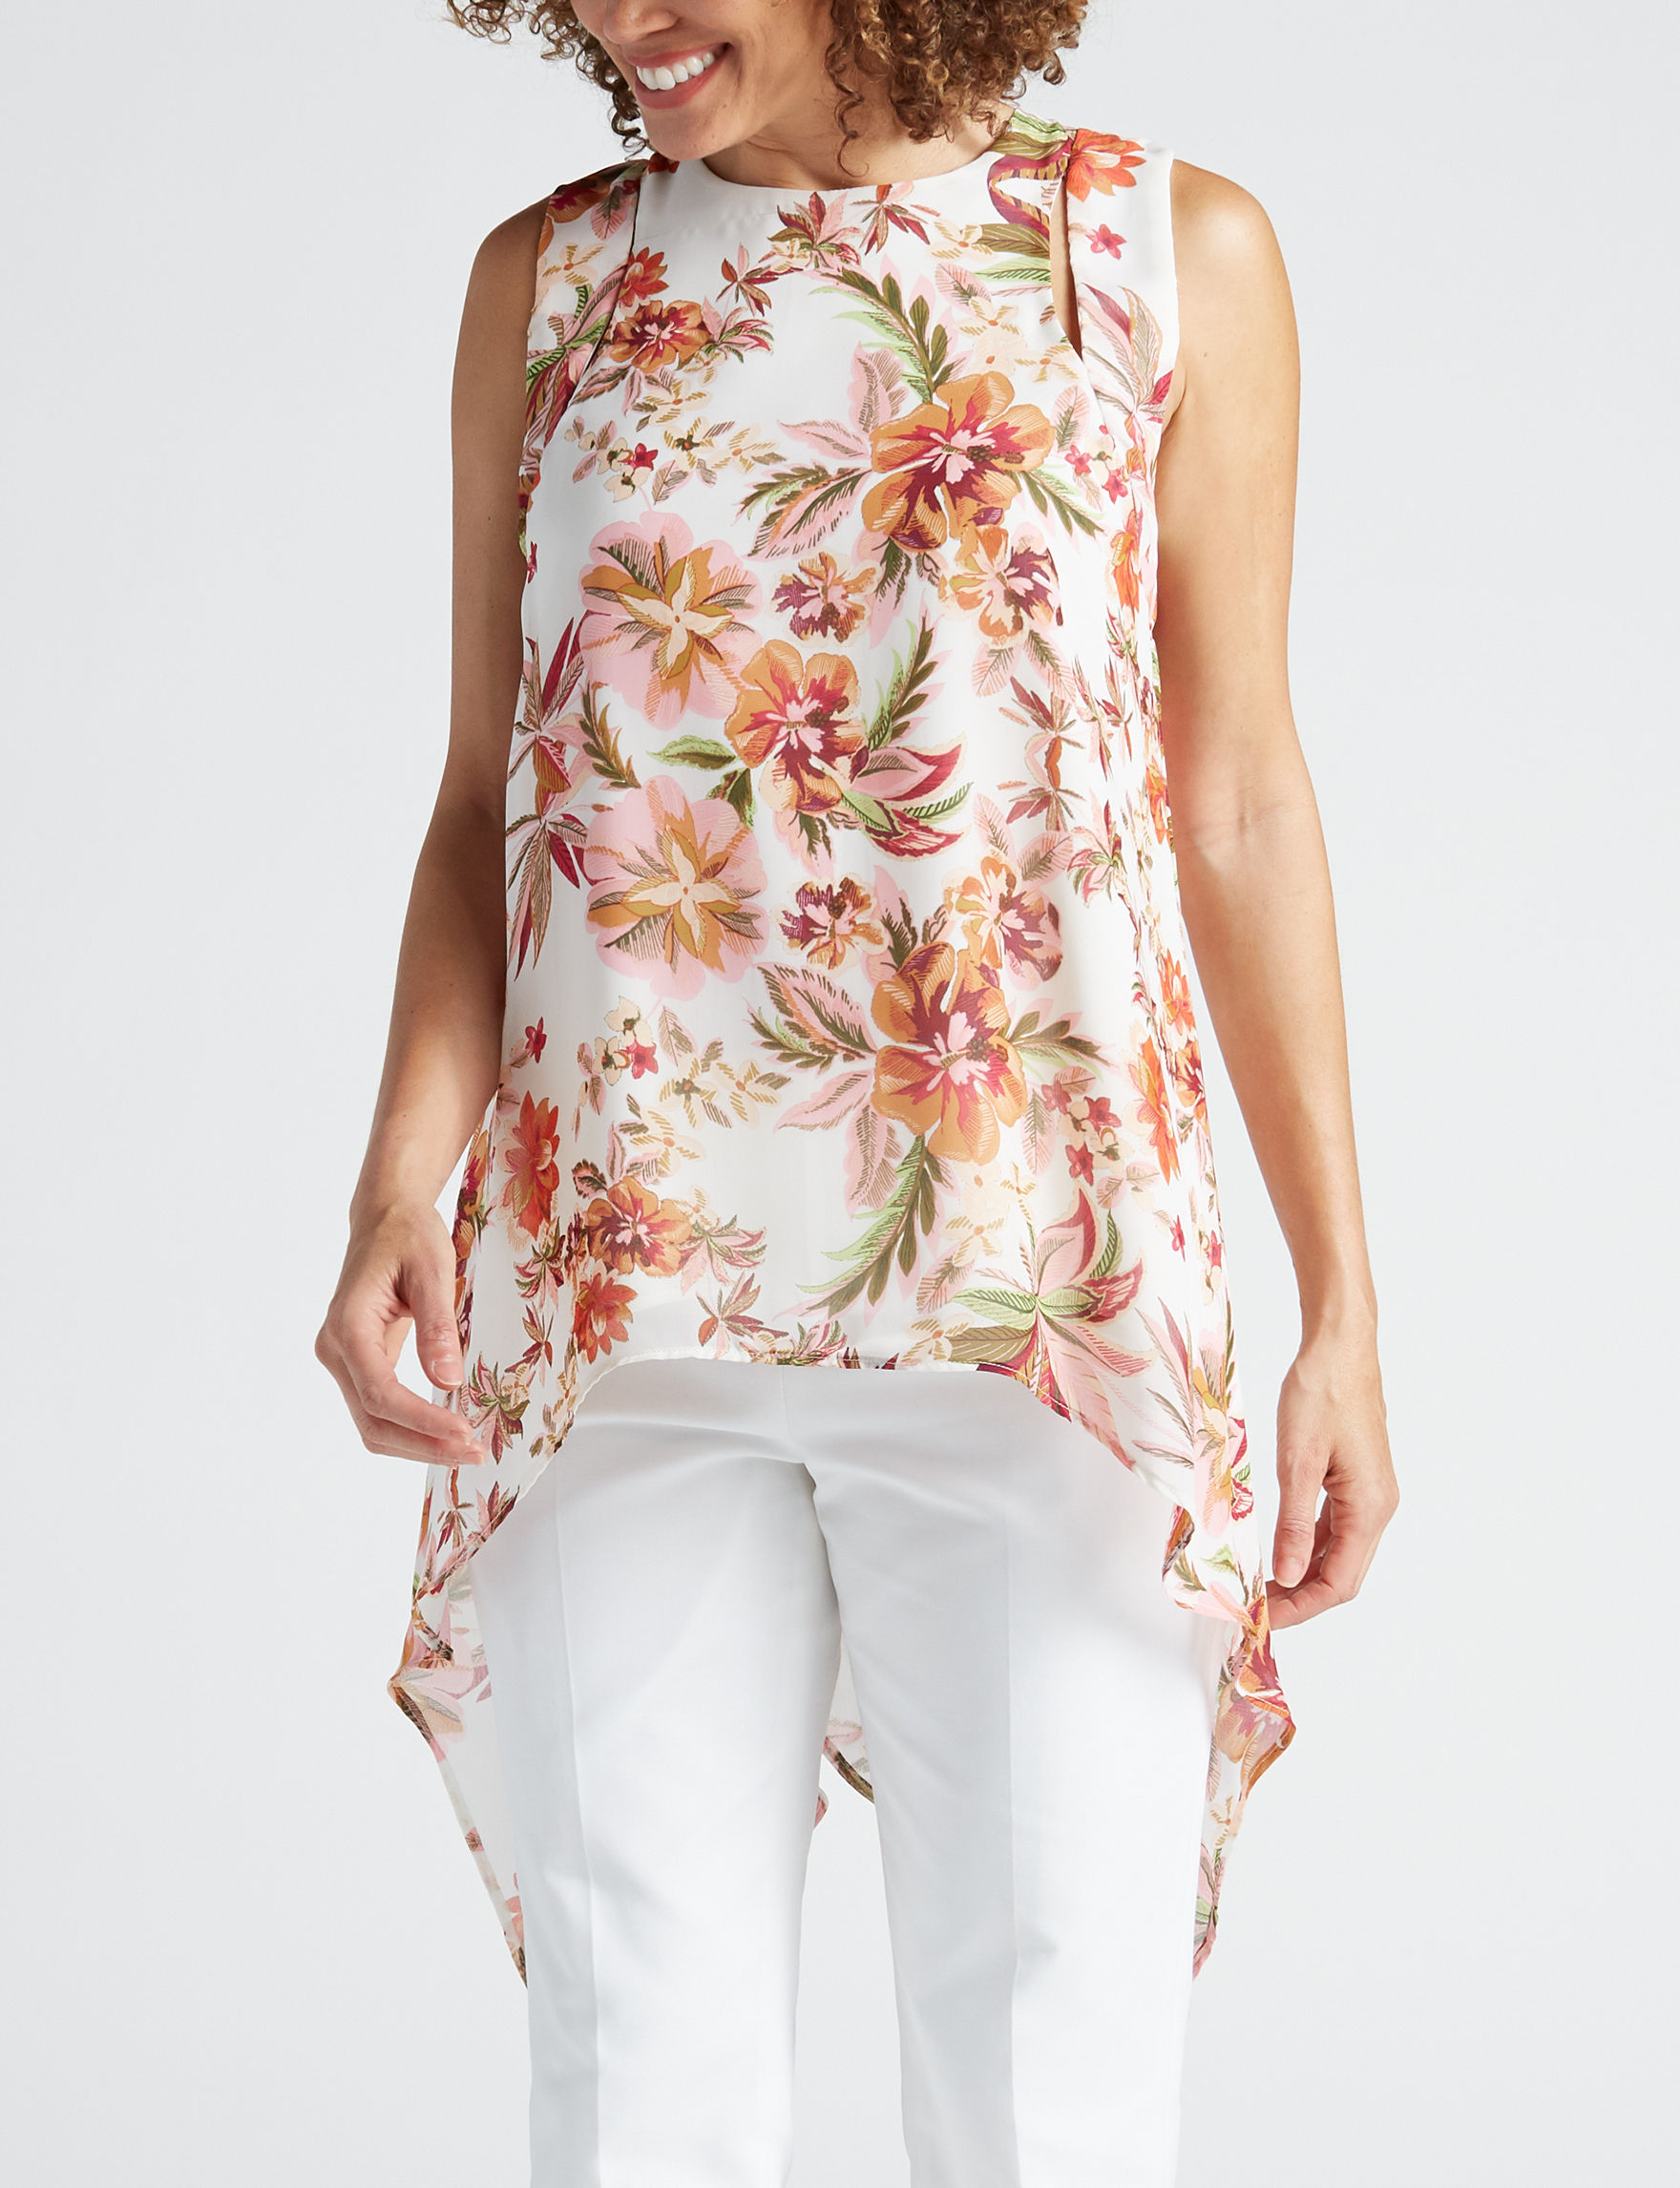 Valerie Stevens Ivory Floral Shirts & Blouses